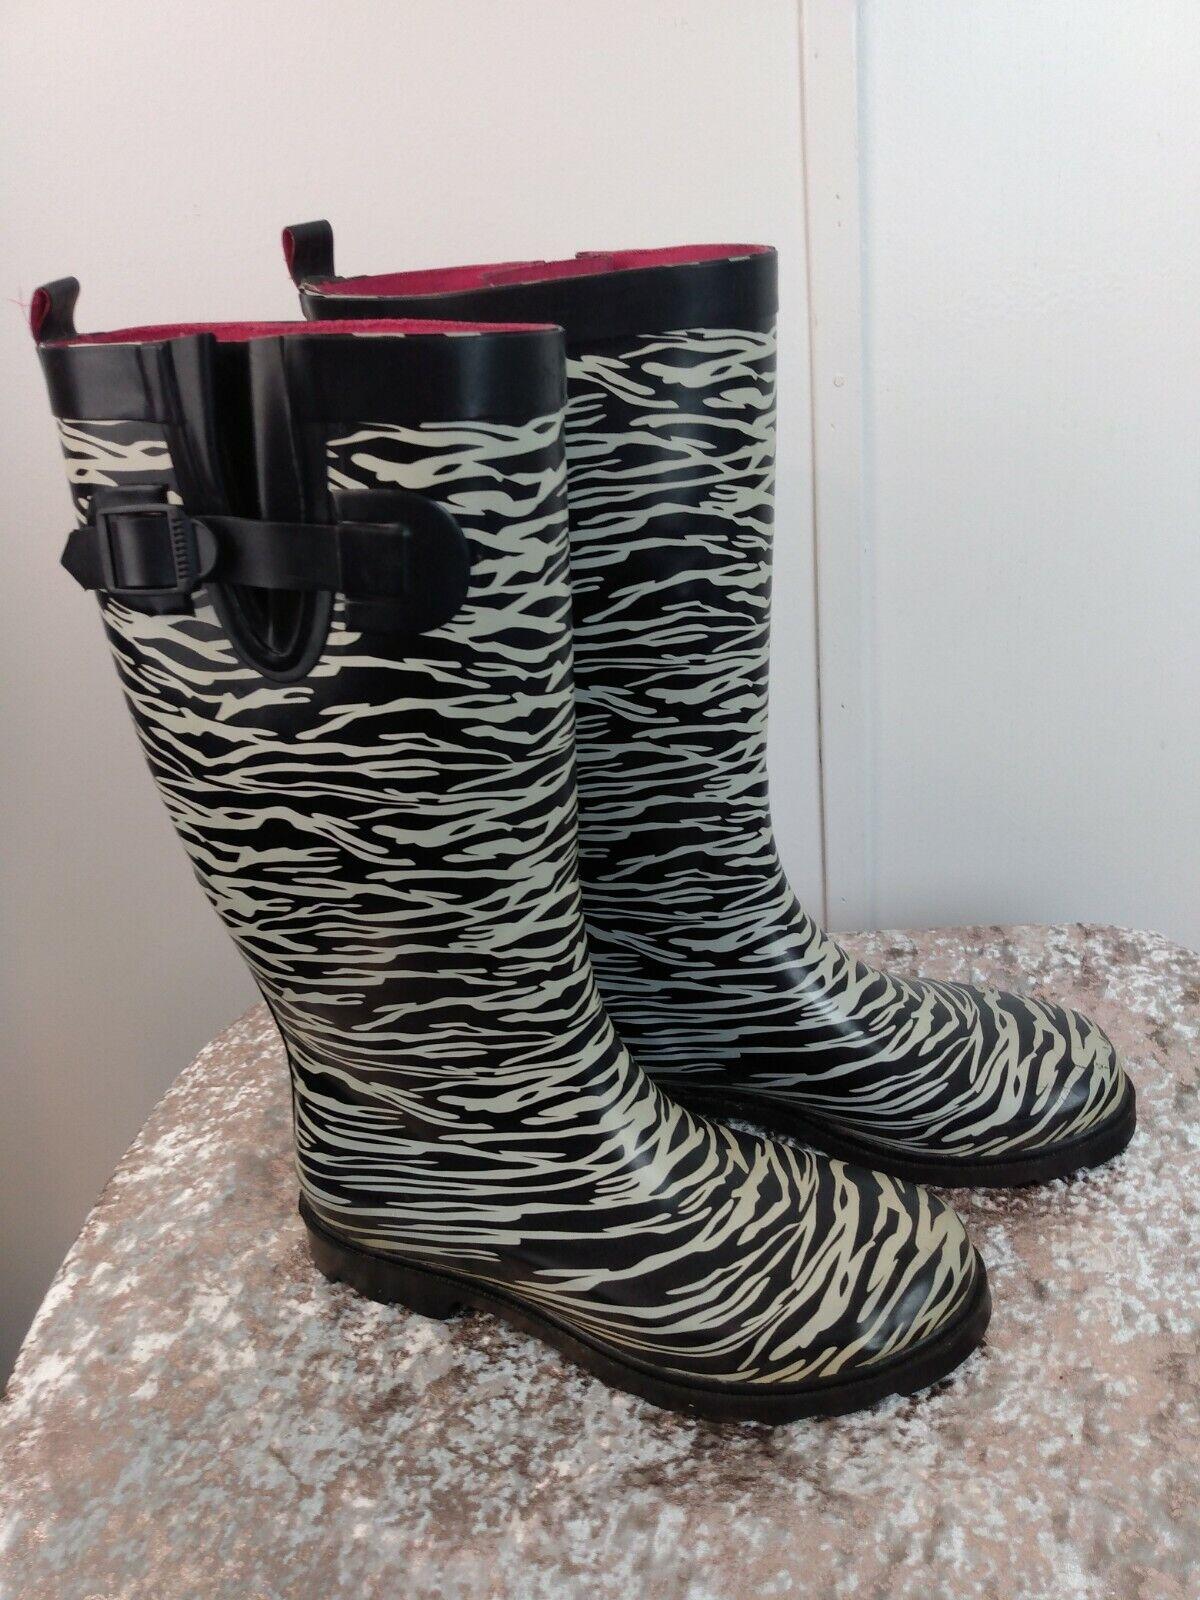 Capelli Zebra Print Rain Boots with Adjustable Ca… - image 2